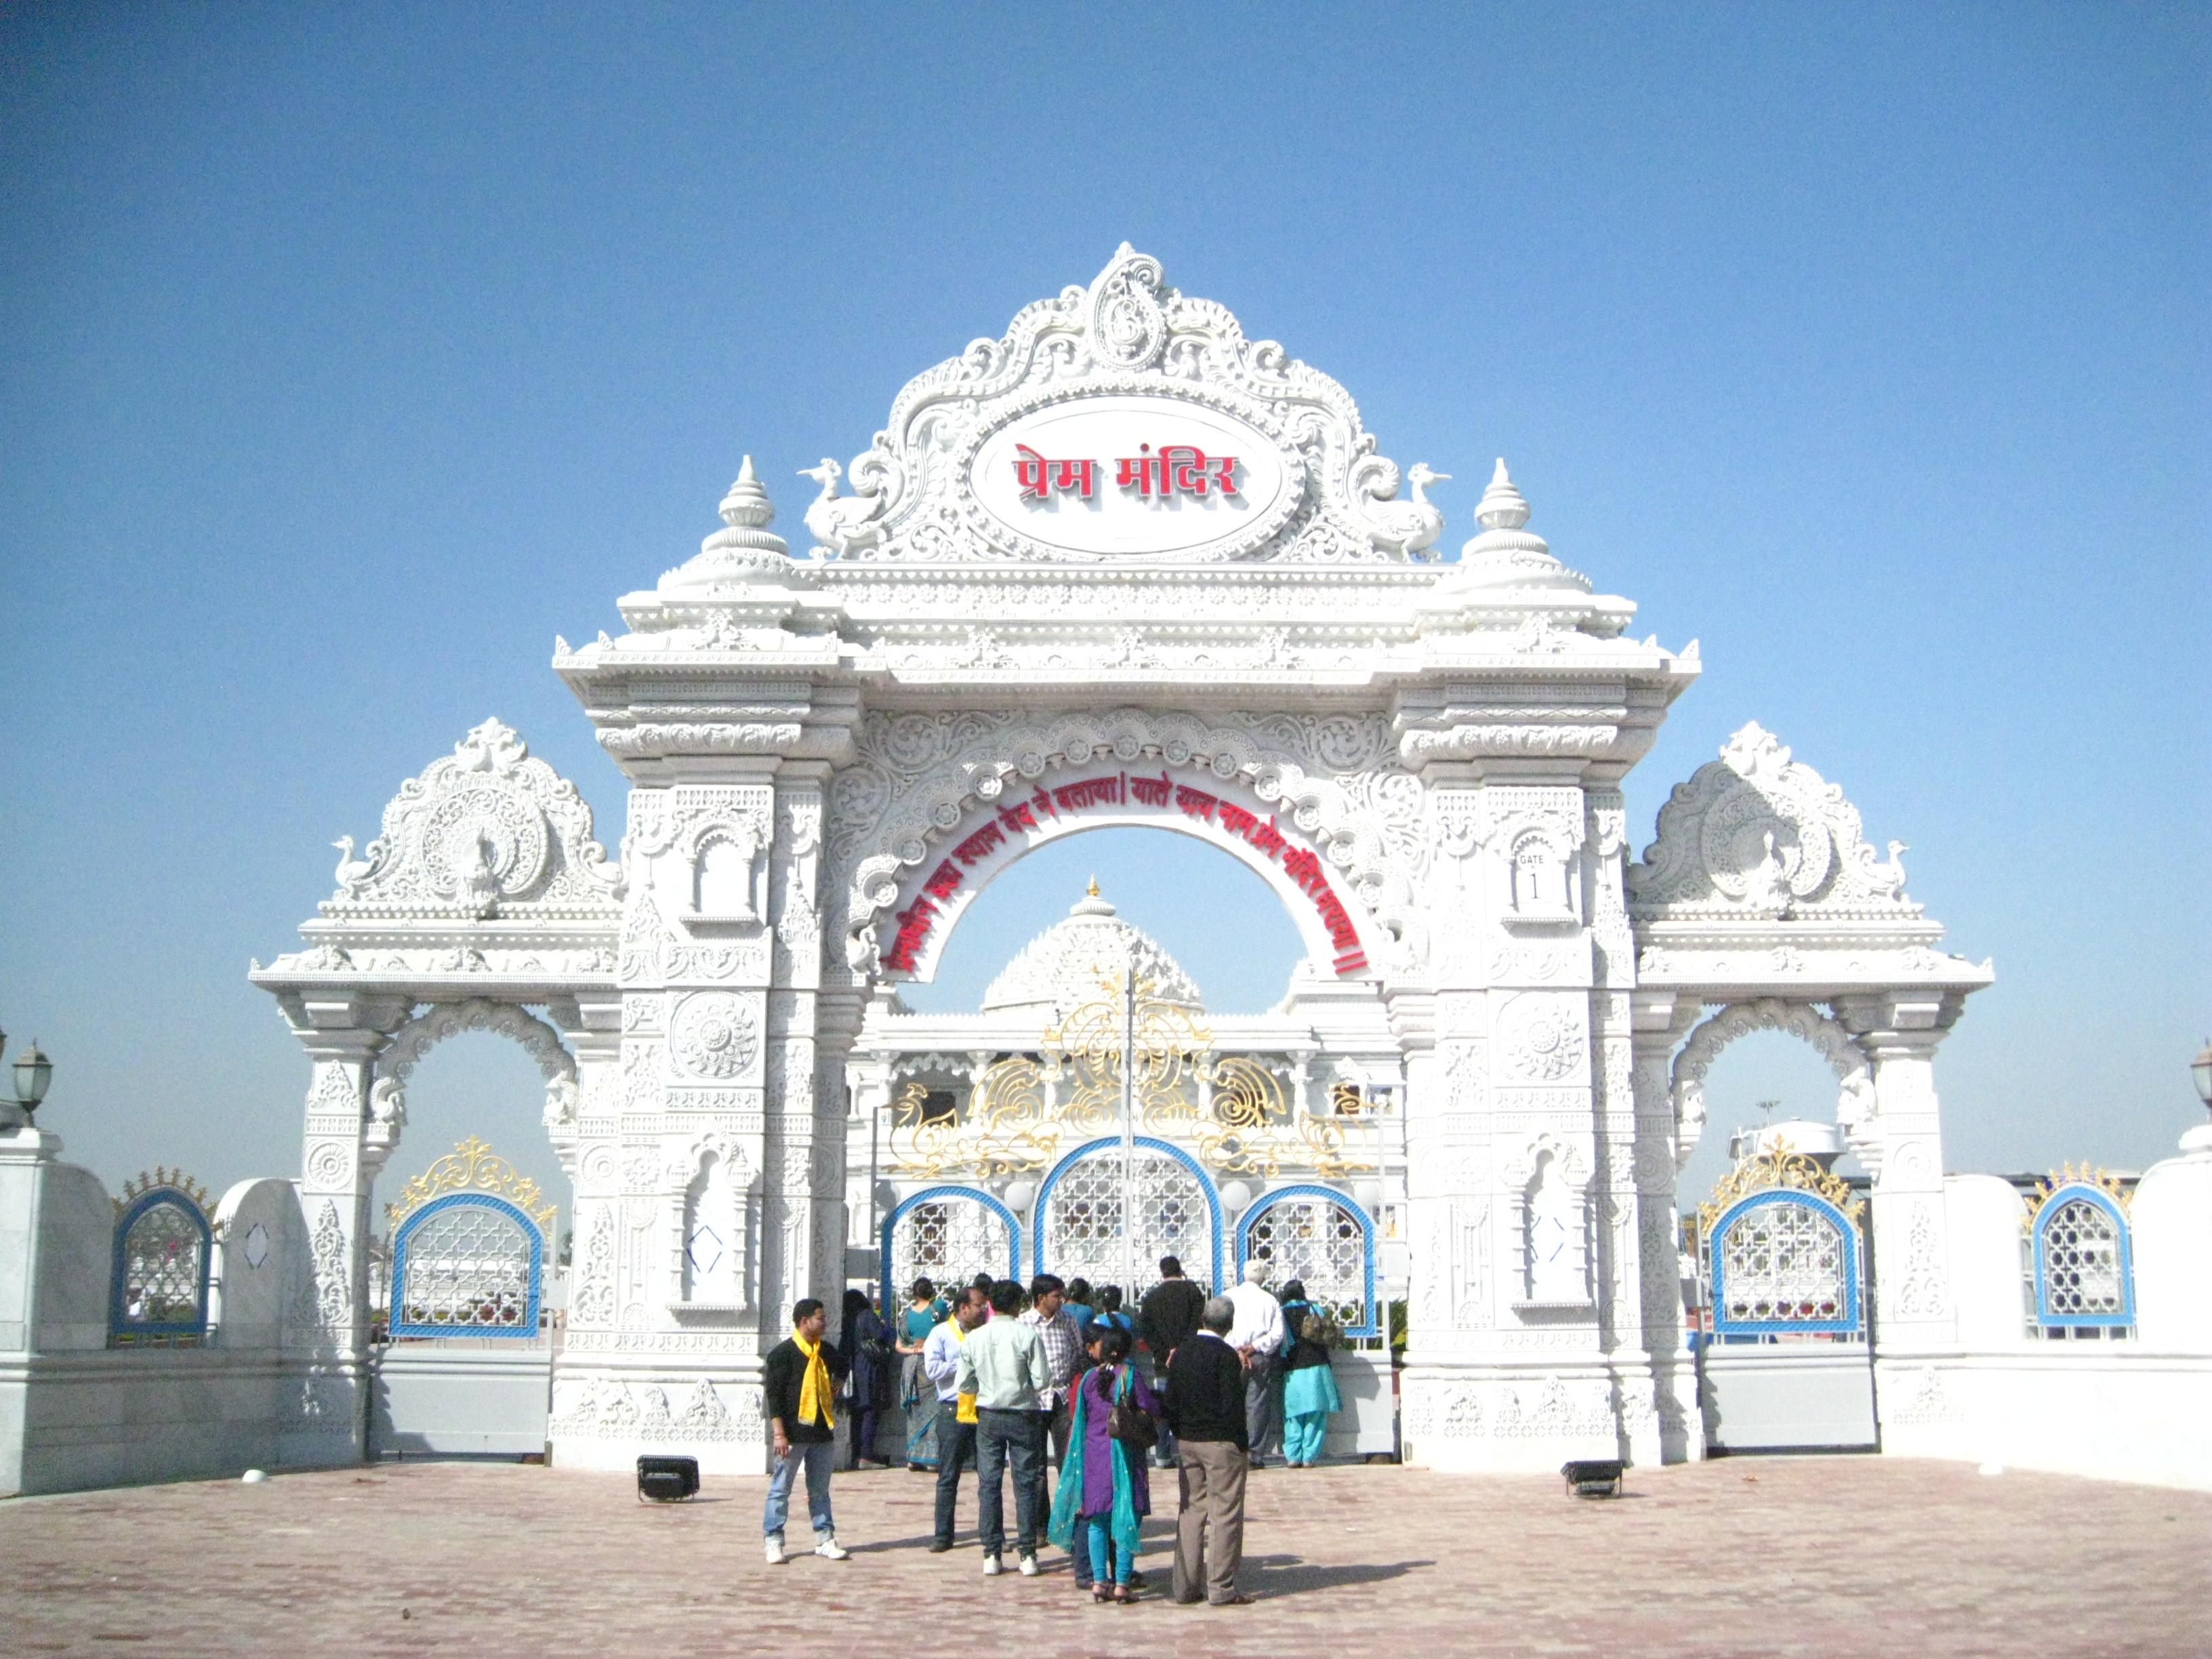 File:Prem mandir Vrindavan Main gate.JPG - Wikimedia Commons